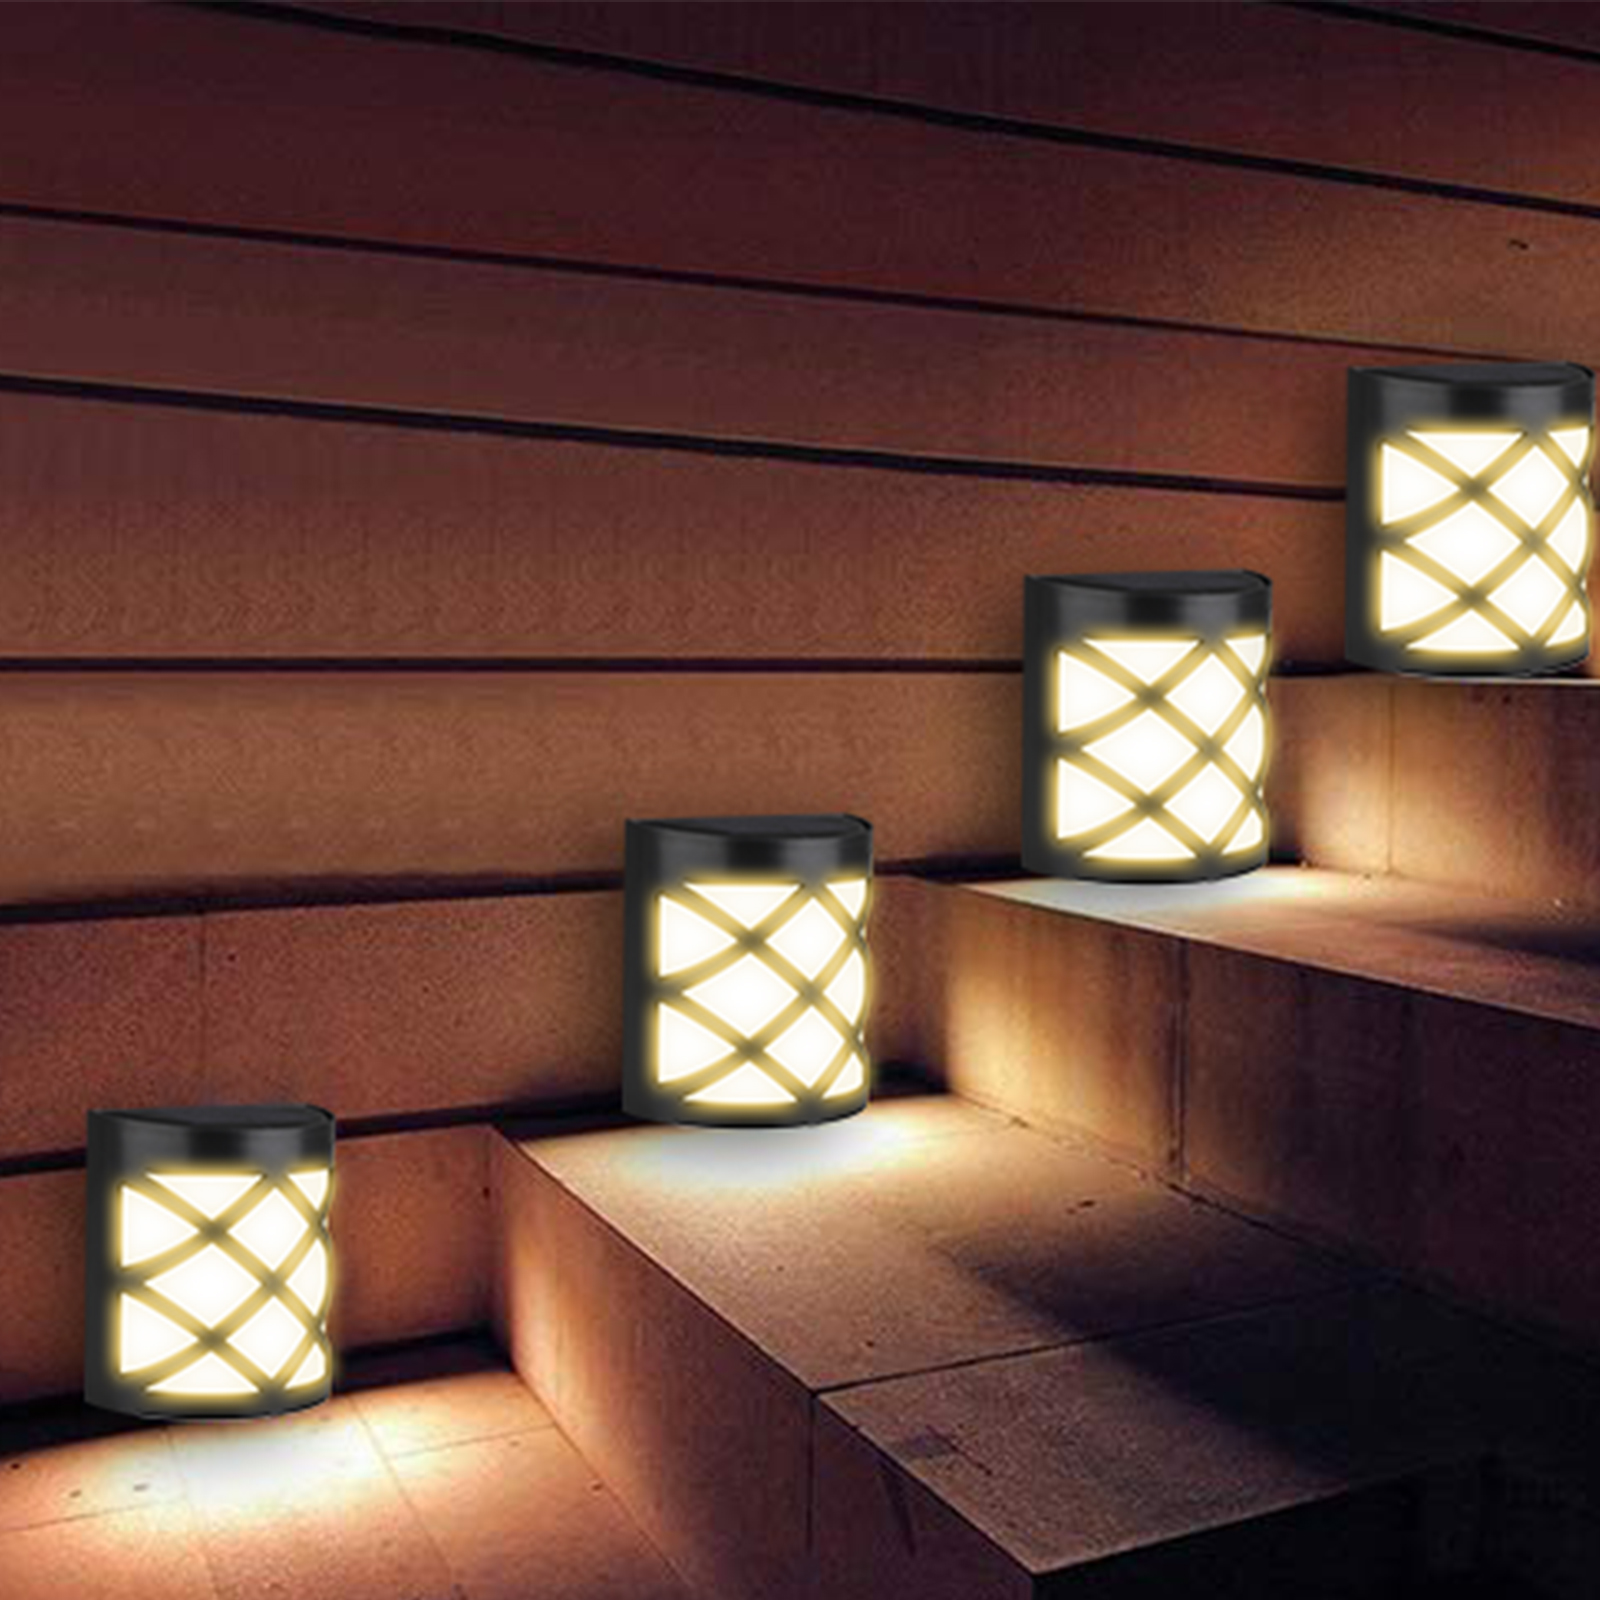 2019 New Solar Light IP65 Waterproof 6 LED PIR Motion Sensor Wall Light Outdoor Sunlight powered lamp for Garden Yard Decoration